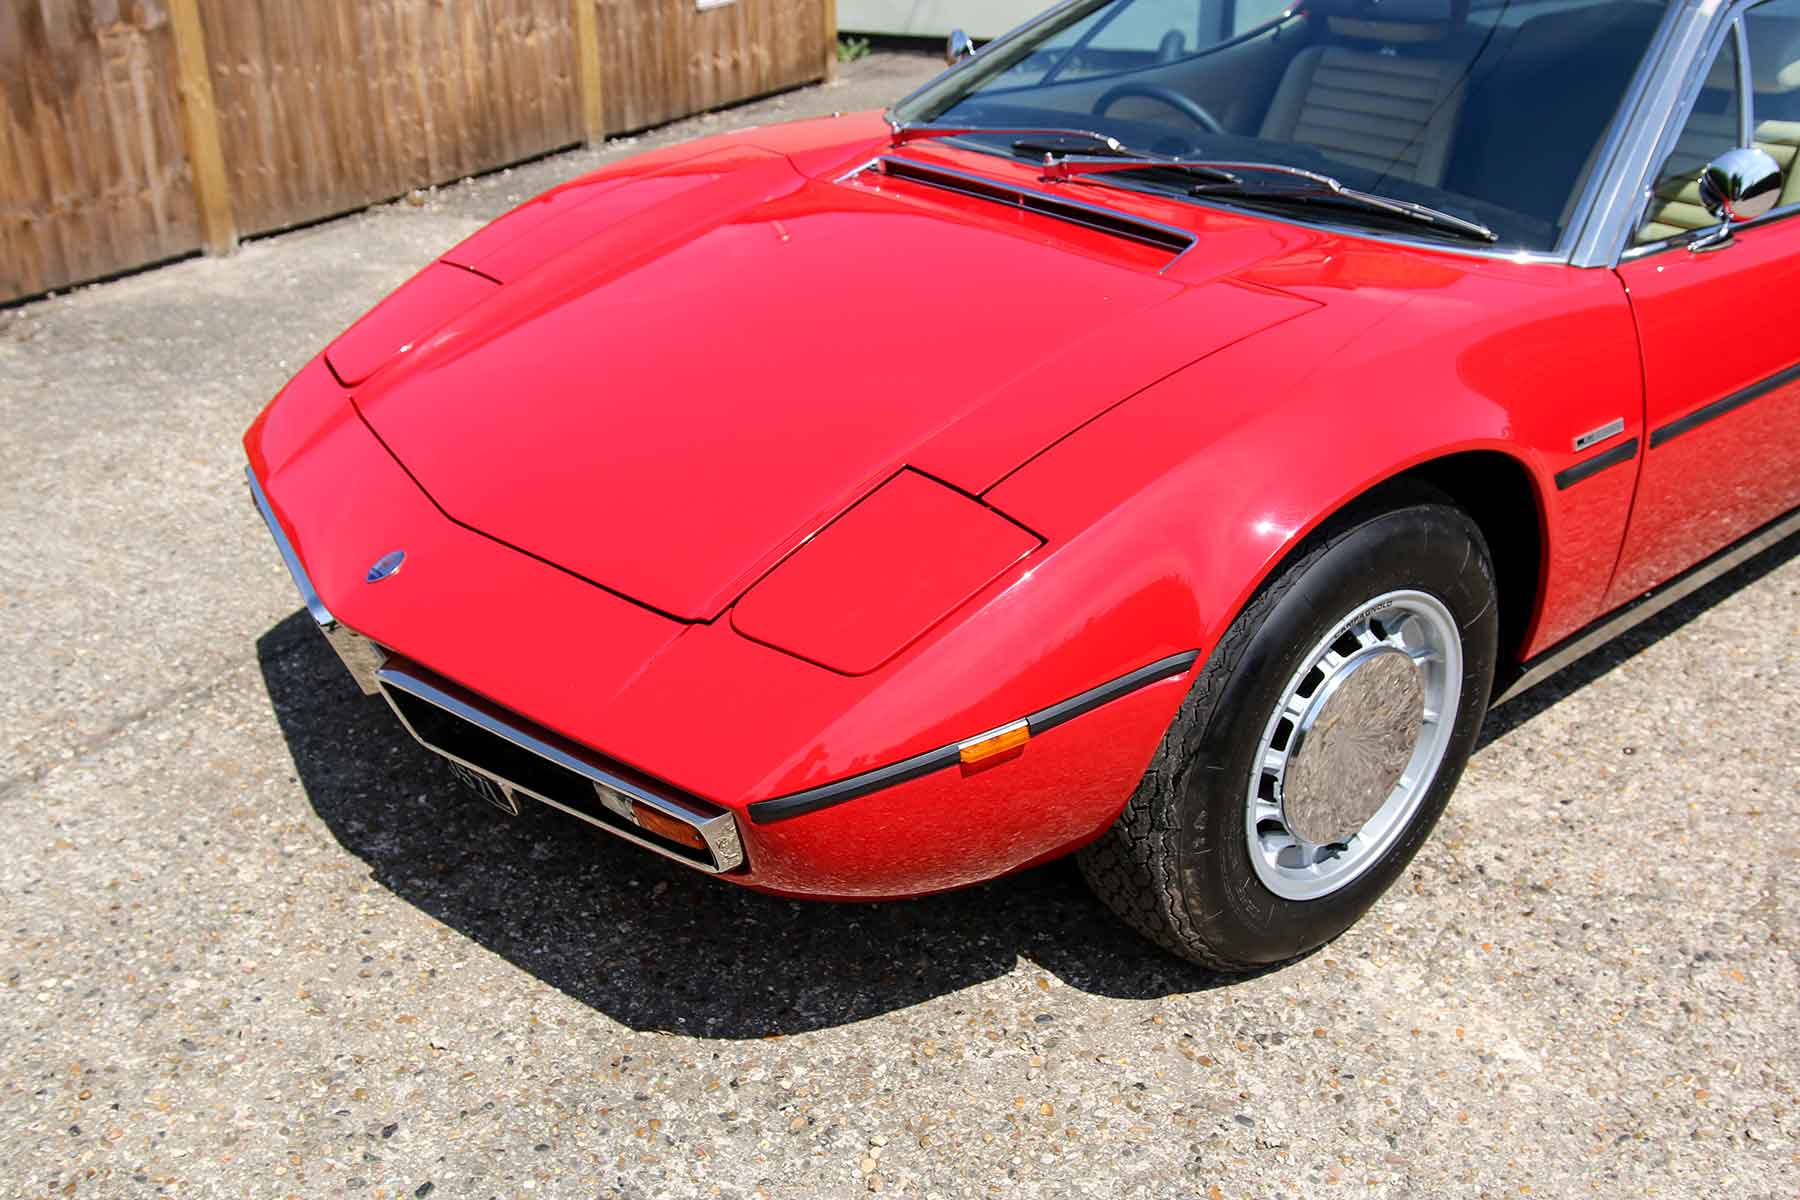 Maserati Archives Motoring Research Wiring Harnesses Fits 1973 Porsche 911 Jim Ellis Parts Bora